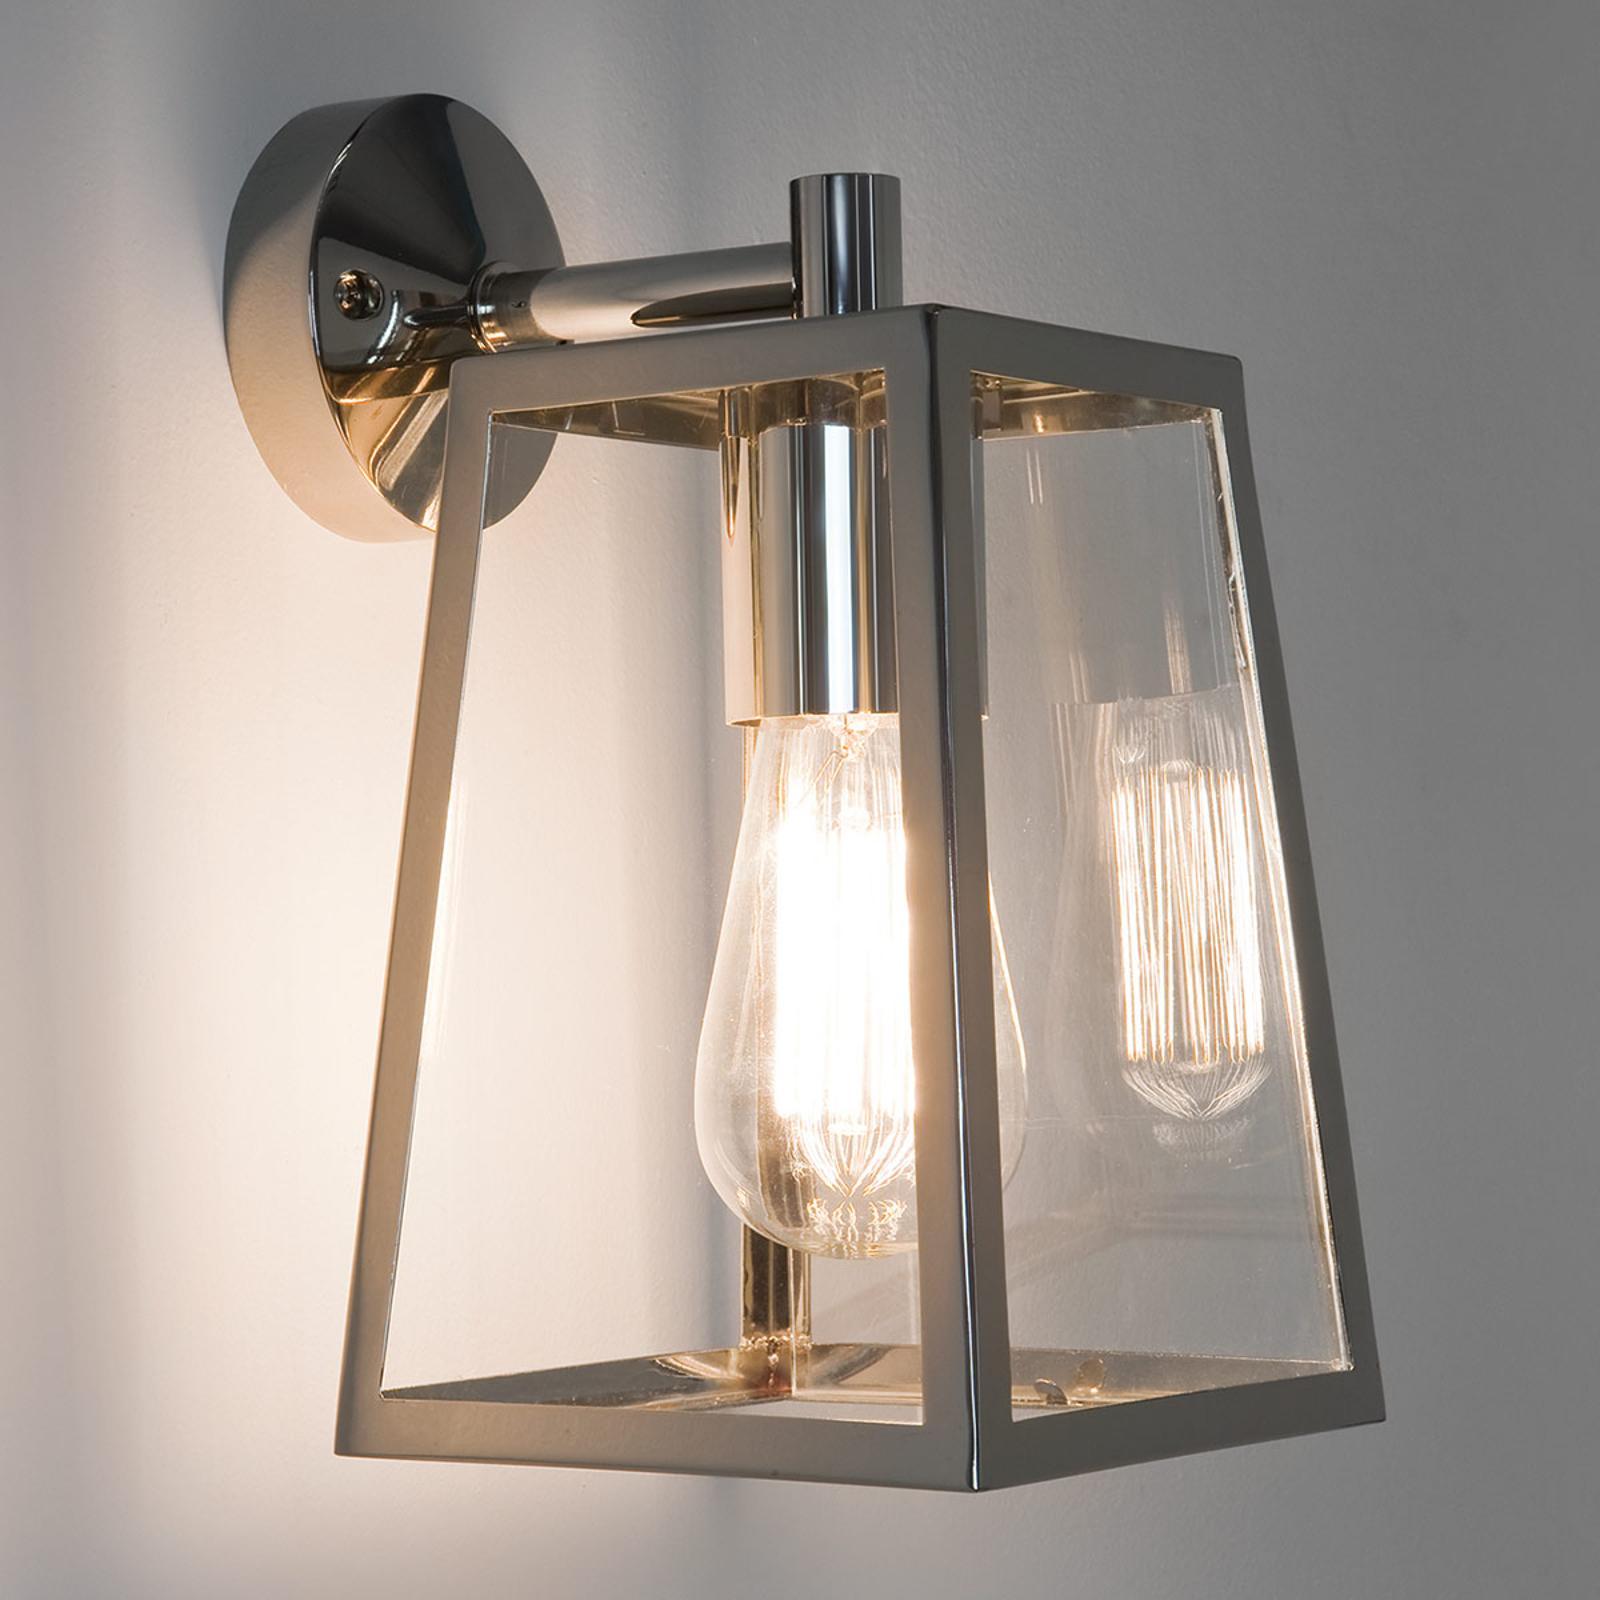 Nikkel-buitenwandlamp Calvi in lantaarnvorm